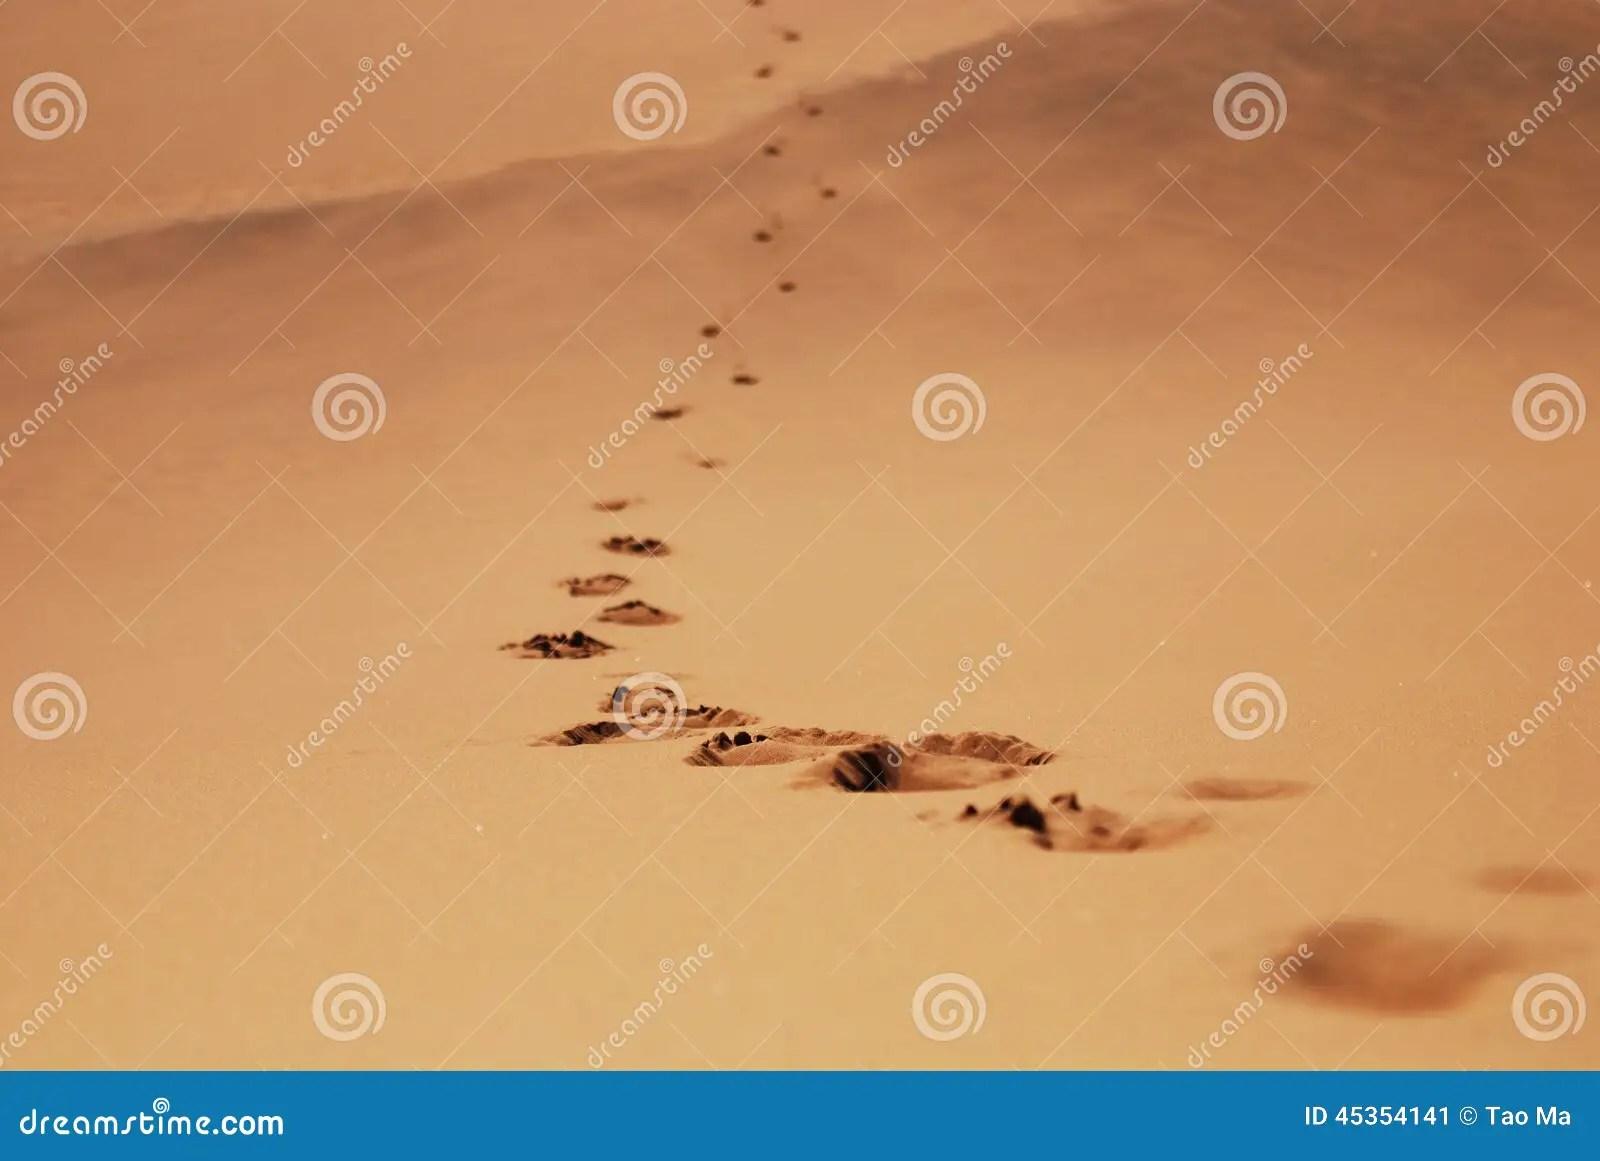 Footprint In Desert Stock Photo